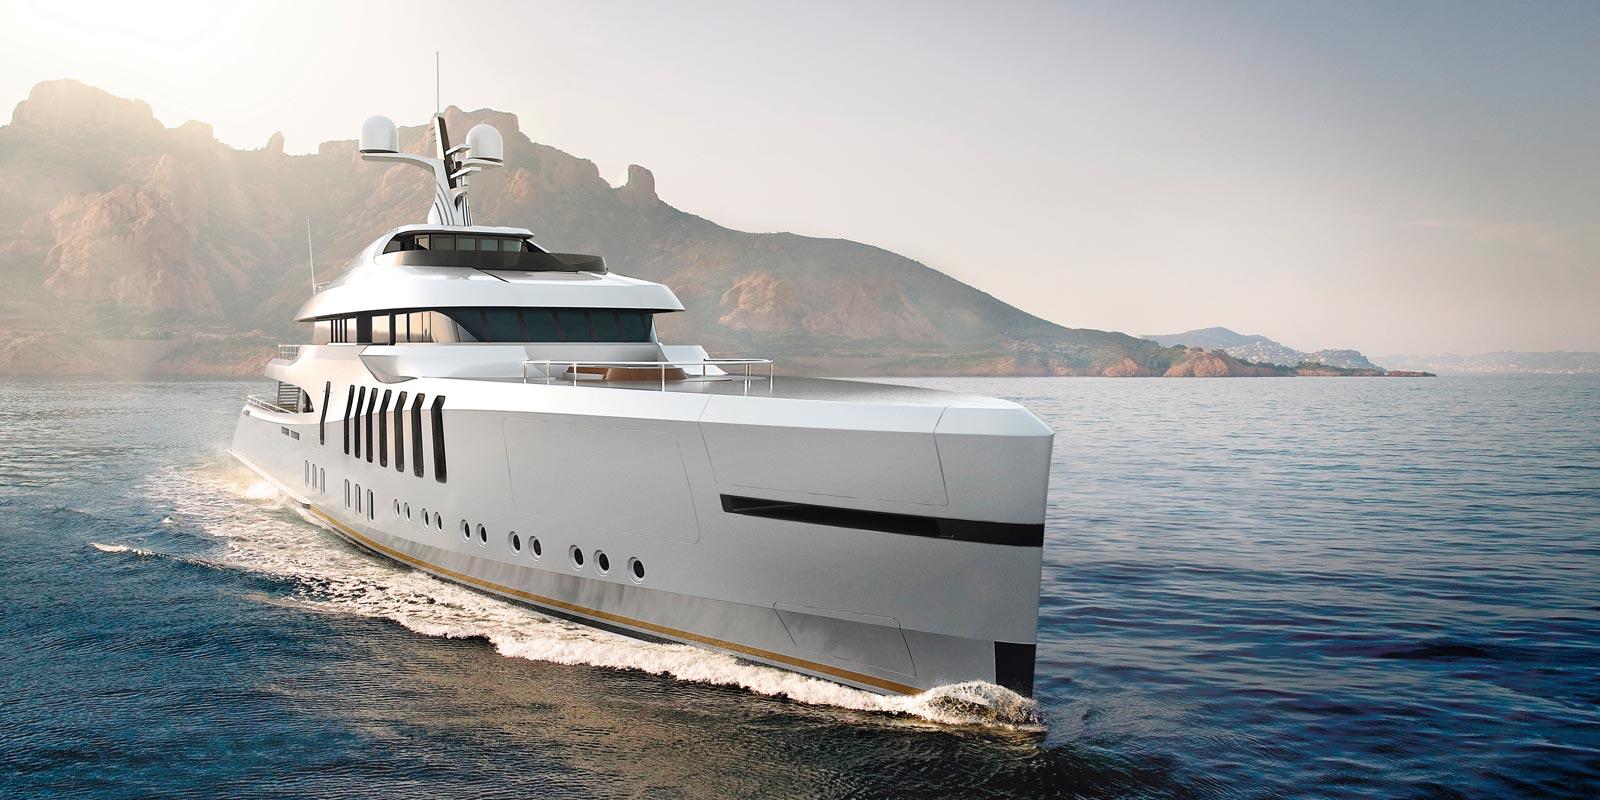 Claydon reeves 70m caspian motor yacht design yacht for Yacht dekoration